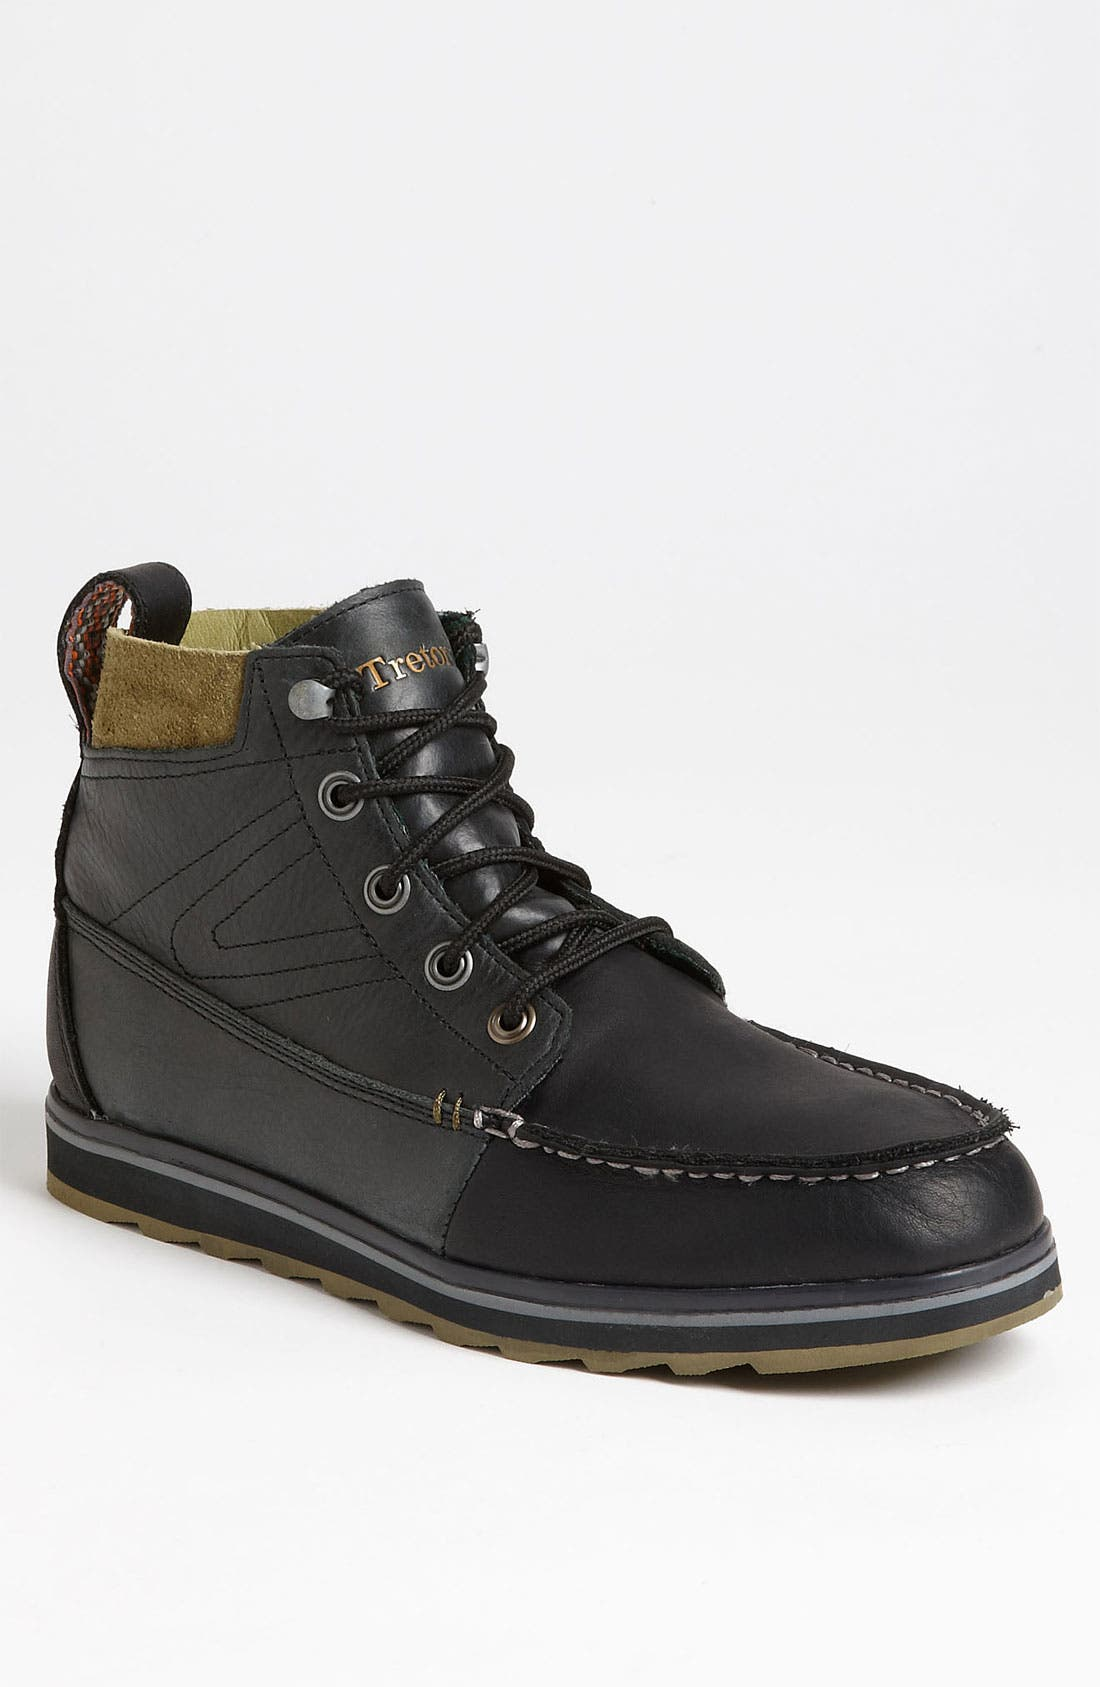 Alternate Image 1 Selected - Tretorn 'Holdyn' Moc Toe Boot